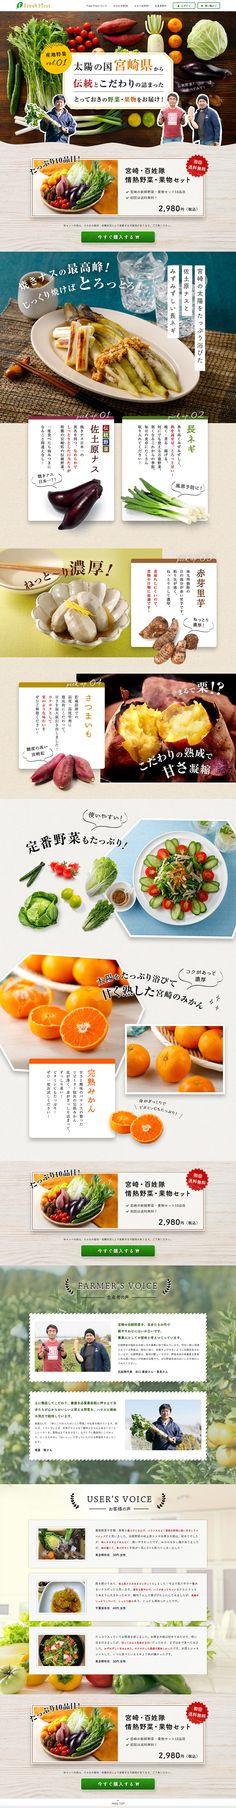 Fresh-First(フレッシュ-ファースト)-産地直送・新鮮野菜果物の宅配ネットスーパー